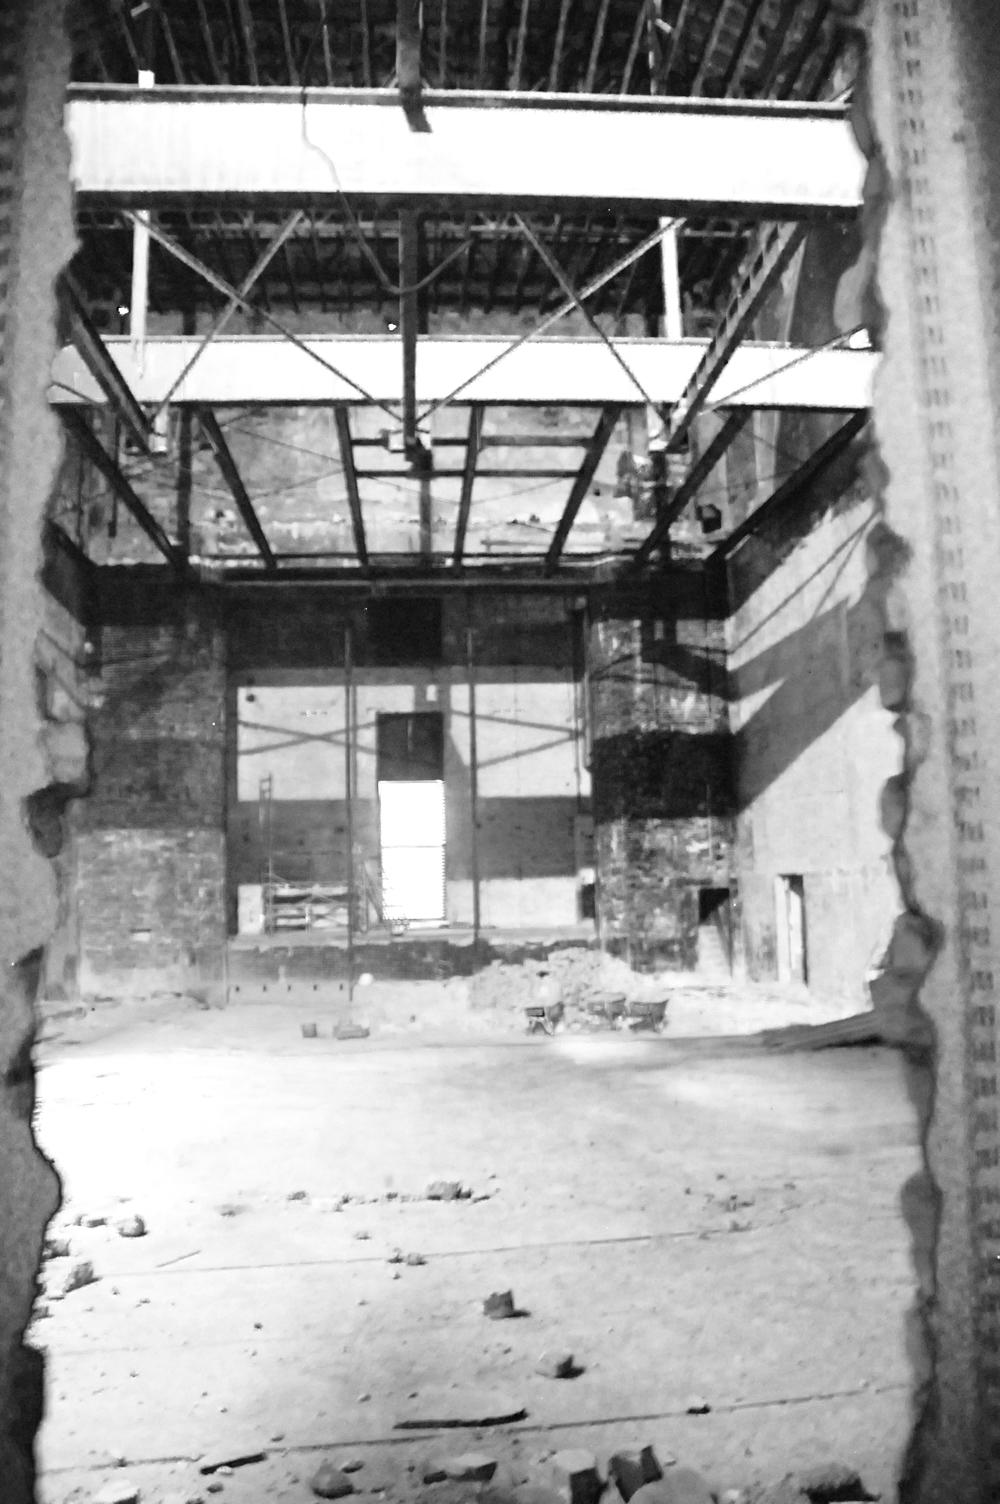 studio-buijs-interieurarchitectuur-den-haag-interiordesign-interieur-asta-theater